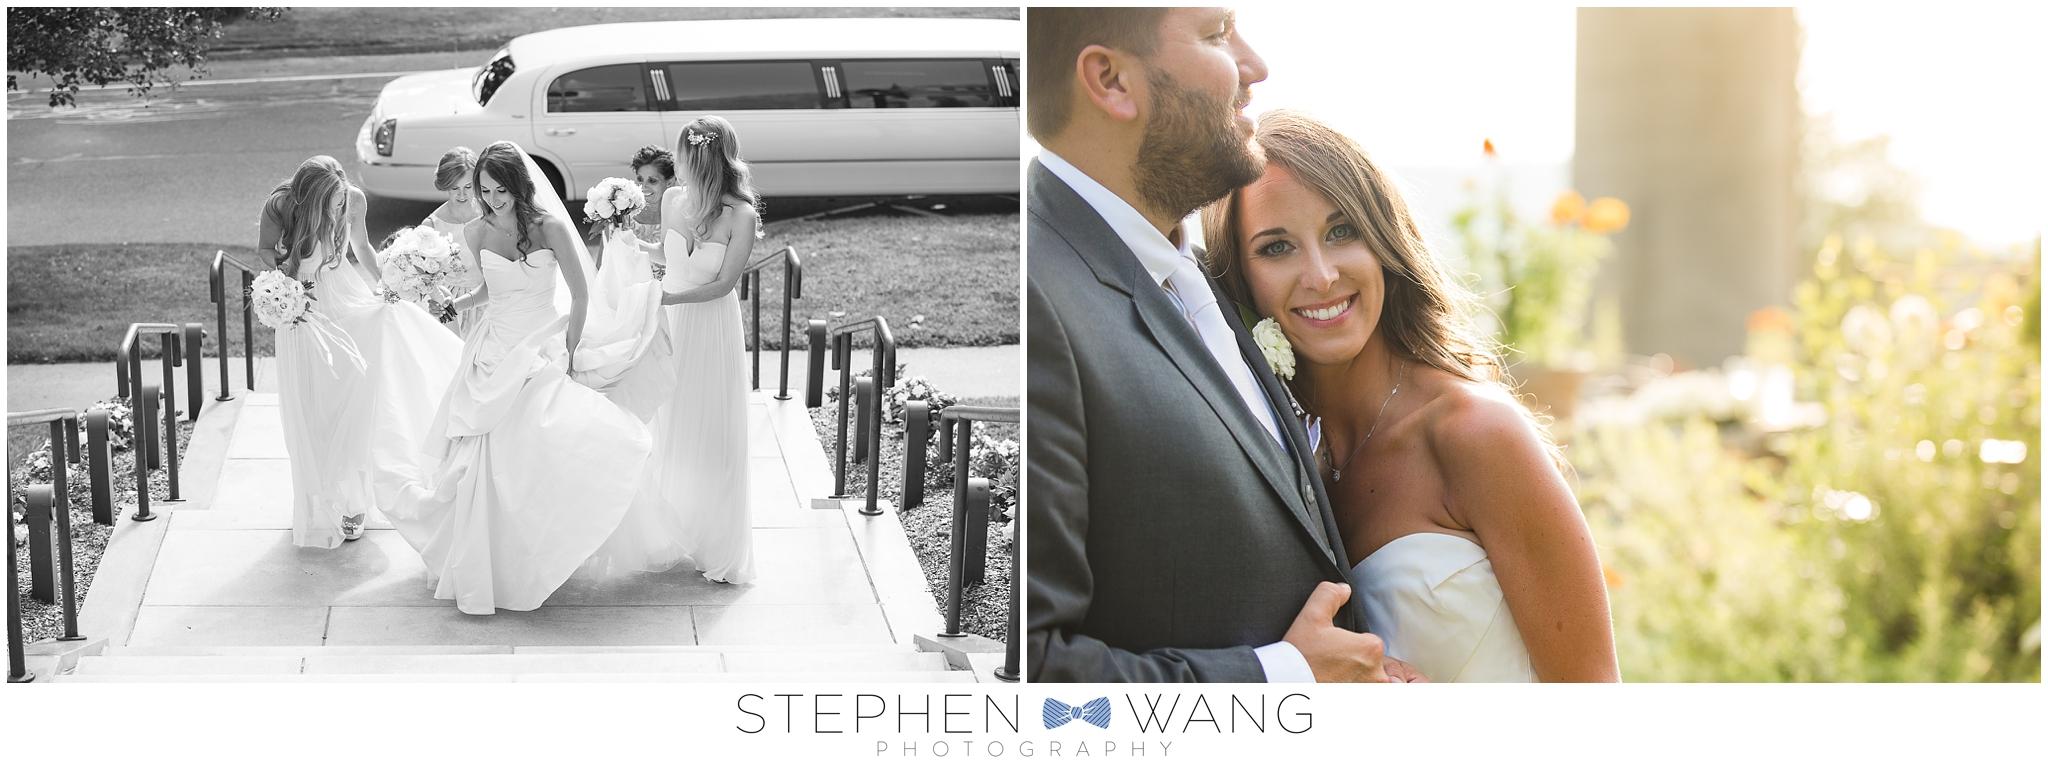 Stephen Wang Photography Wedding Photographer Connecticut CT-12-24_0003.jpg